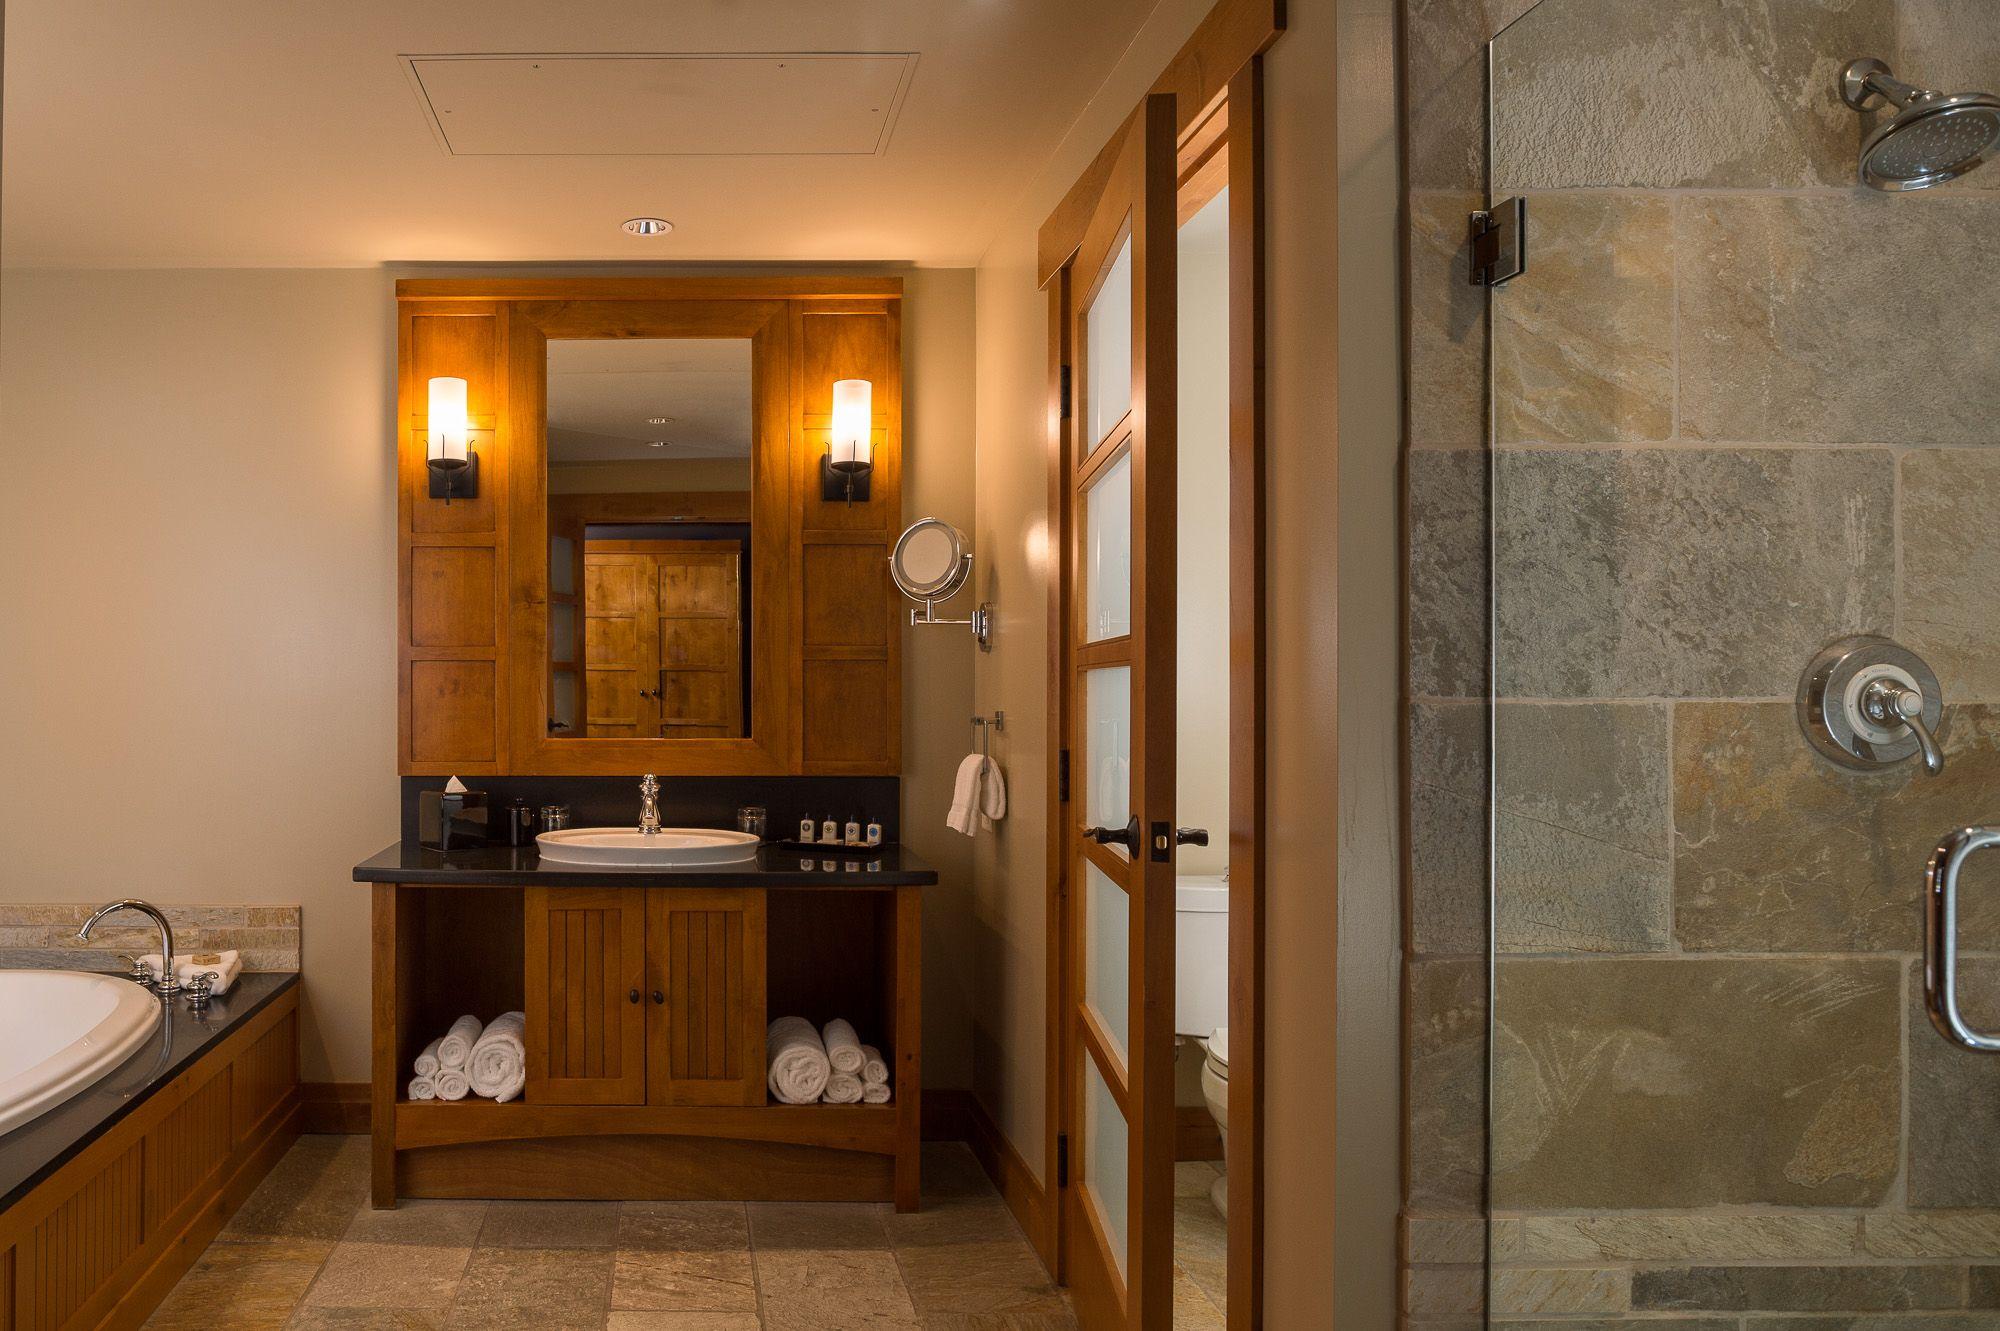 Suite Bathroom at Nita Lake Lodge, Whistler BC